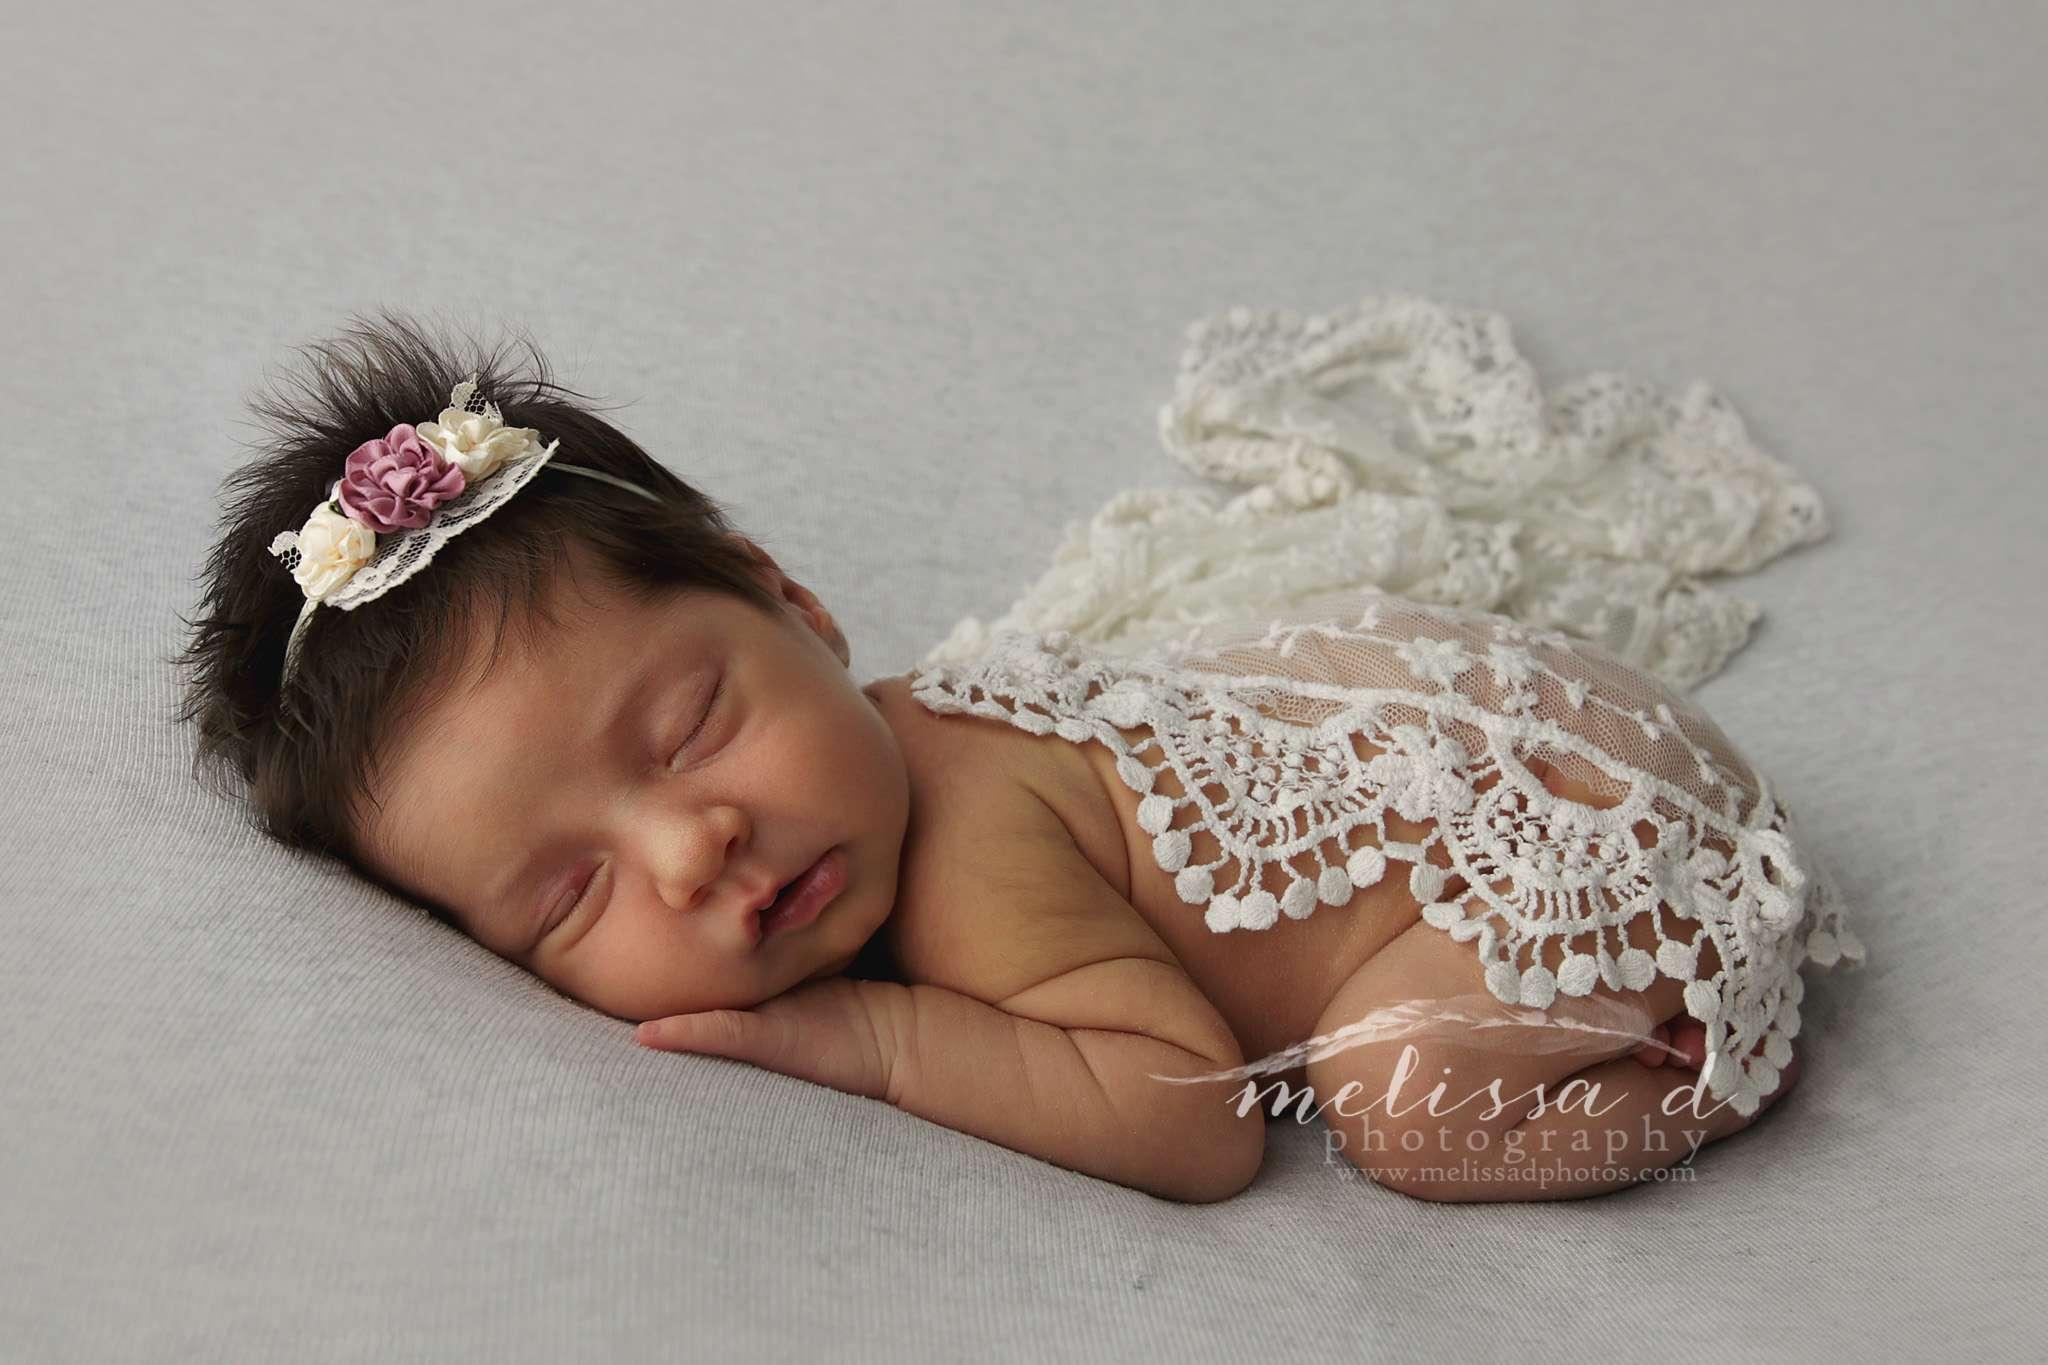 Ft. Worth Newborn Photographer